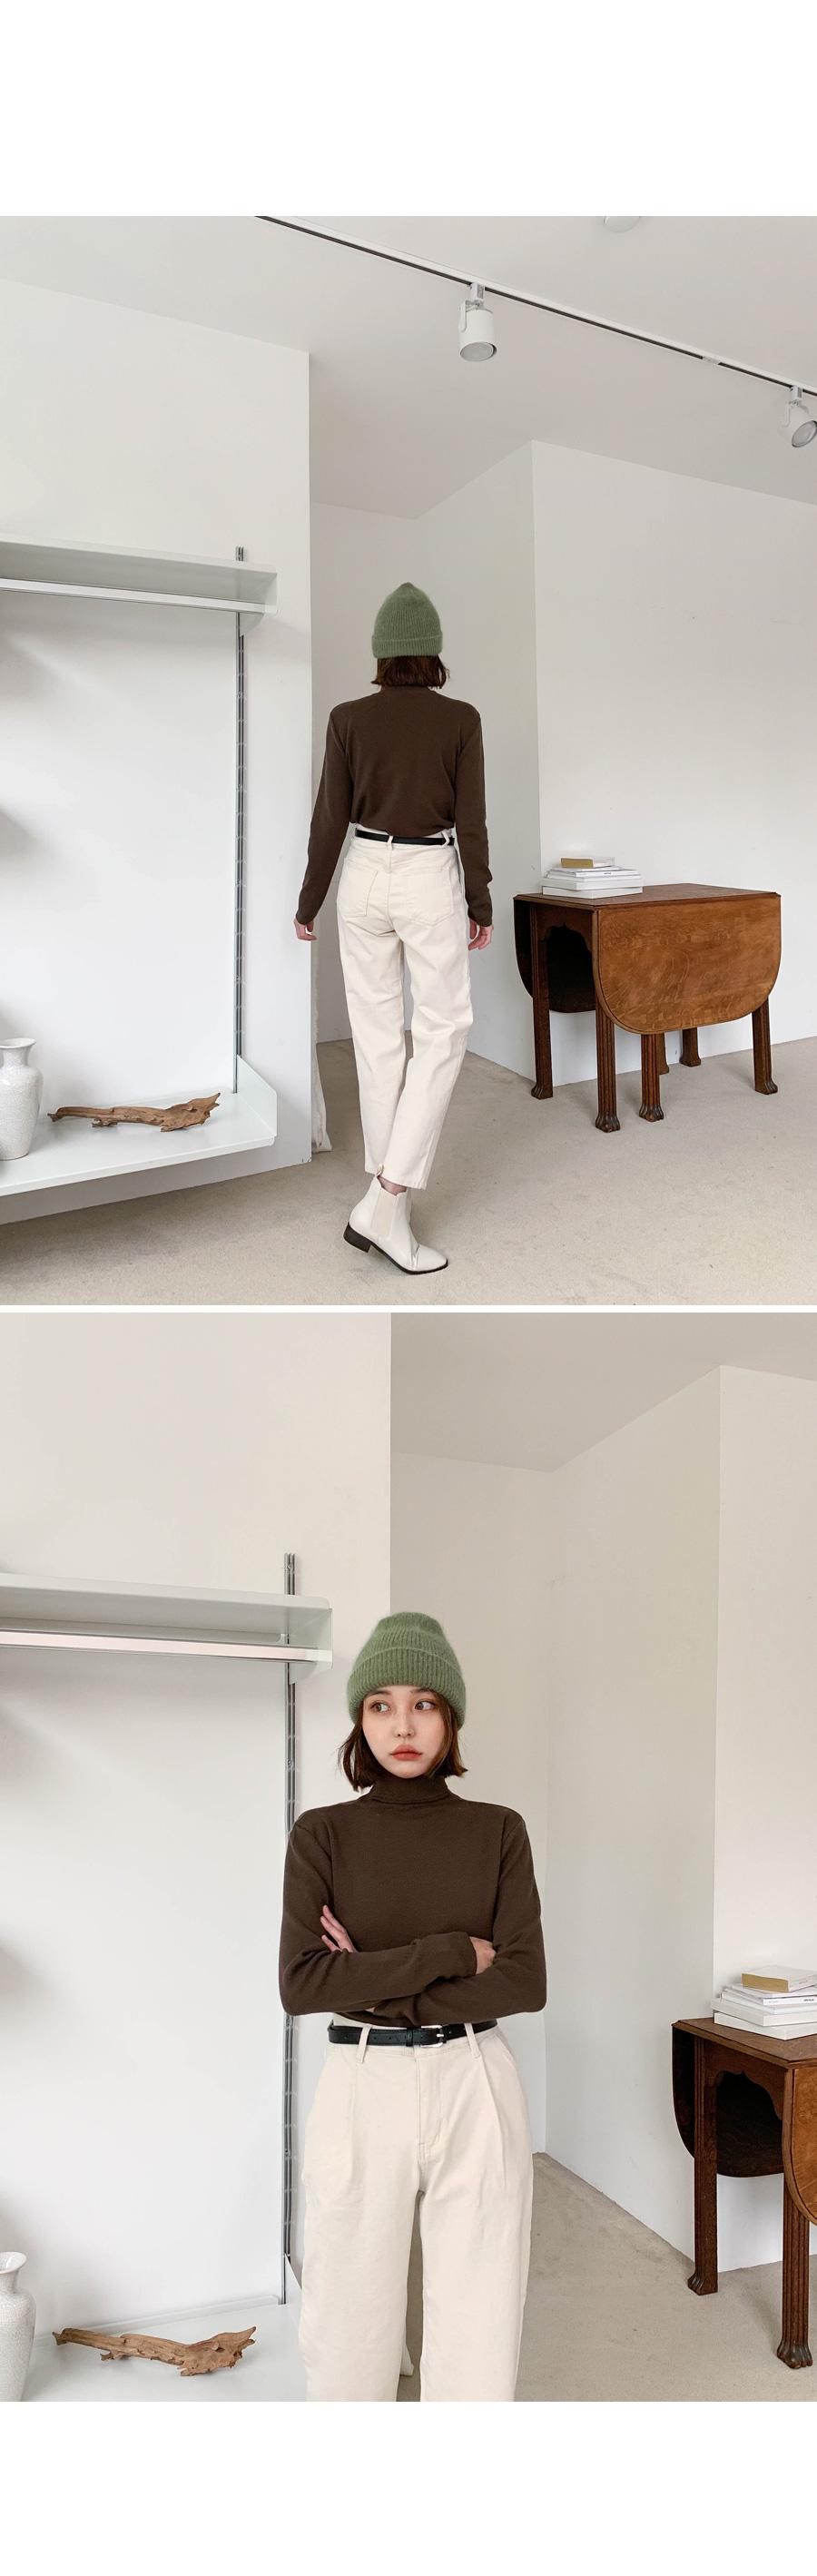 Pintuck brushed cream pants